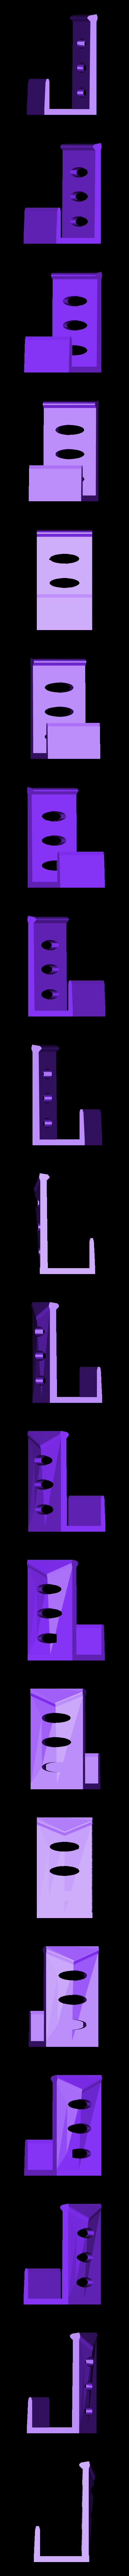 Closelid.stl Download free STL file Box with hinge • 3D printable design, Minweth